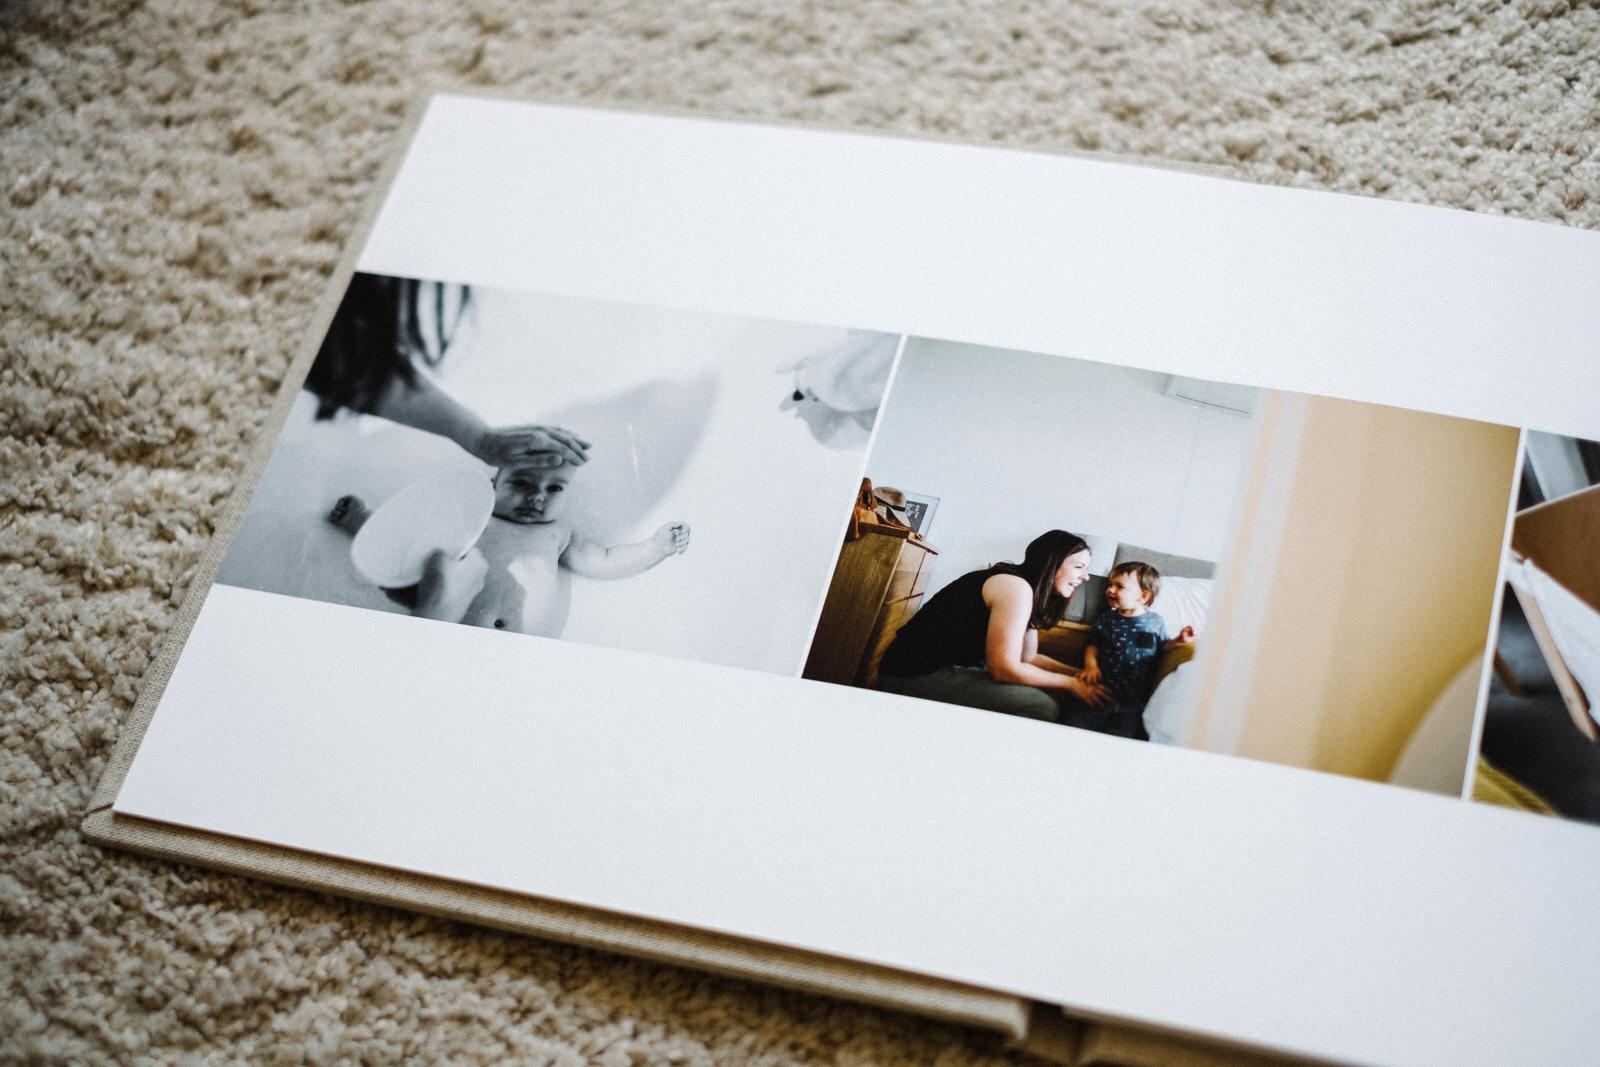 family-story-photos-photo-album-02.jpg